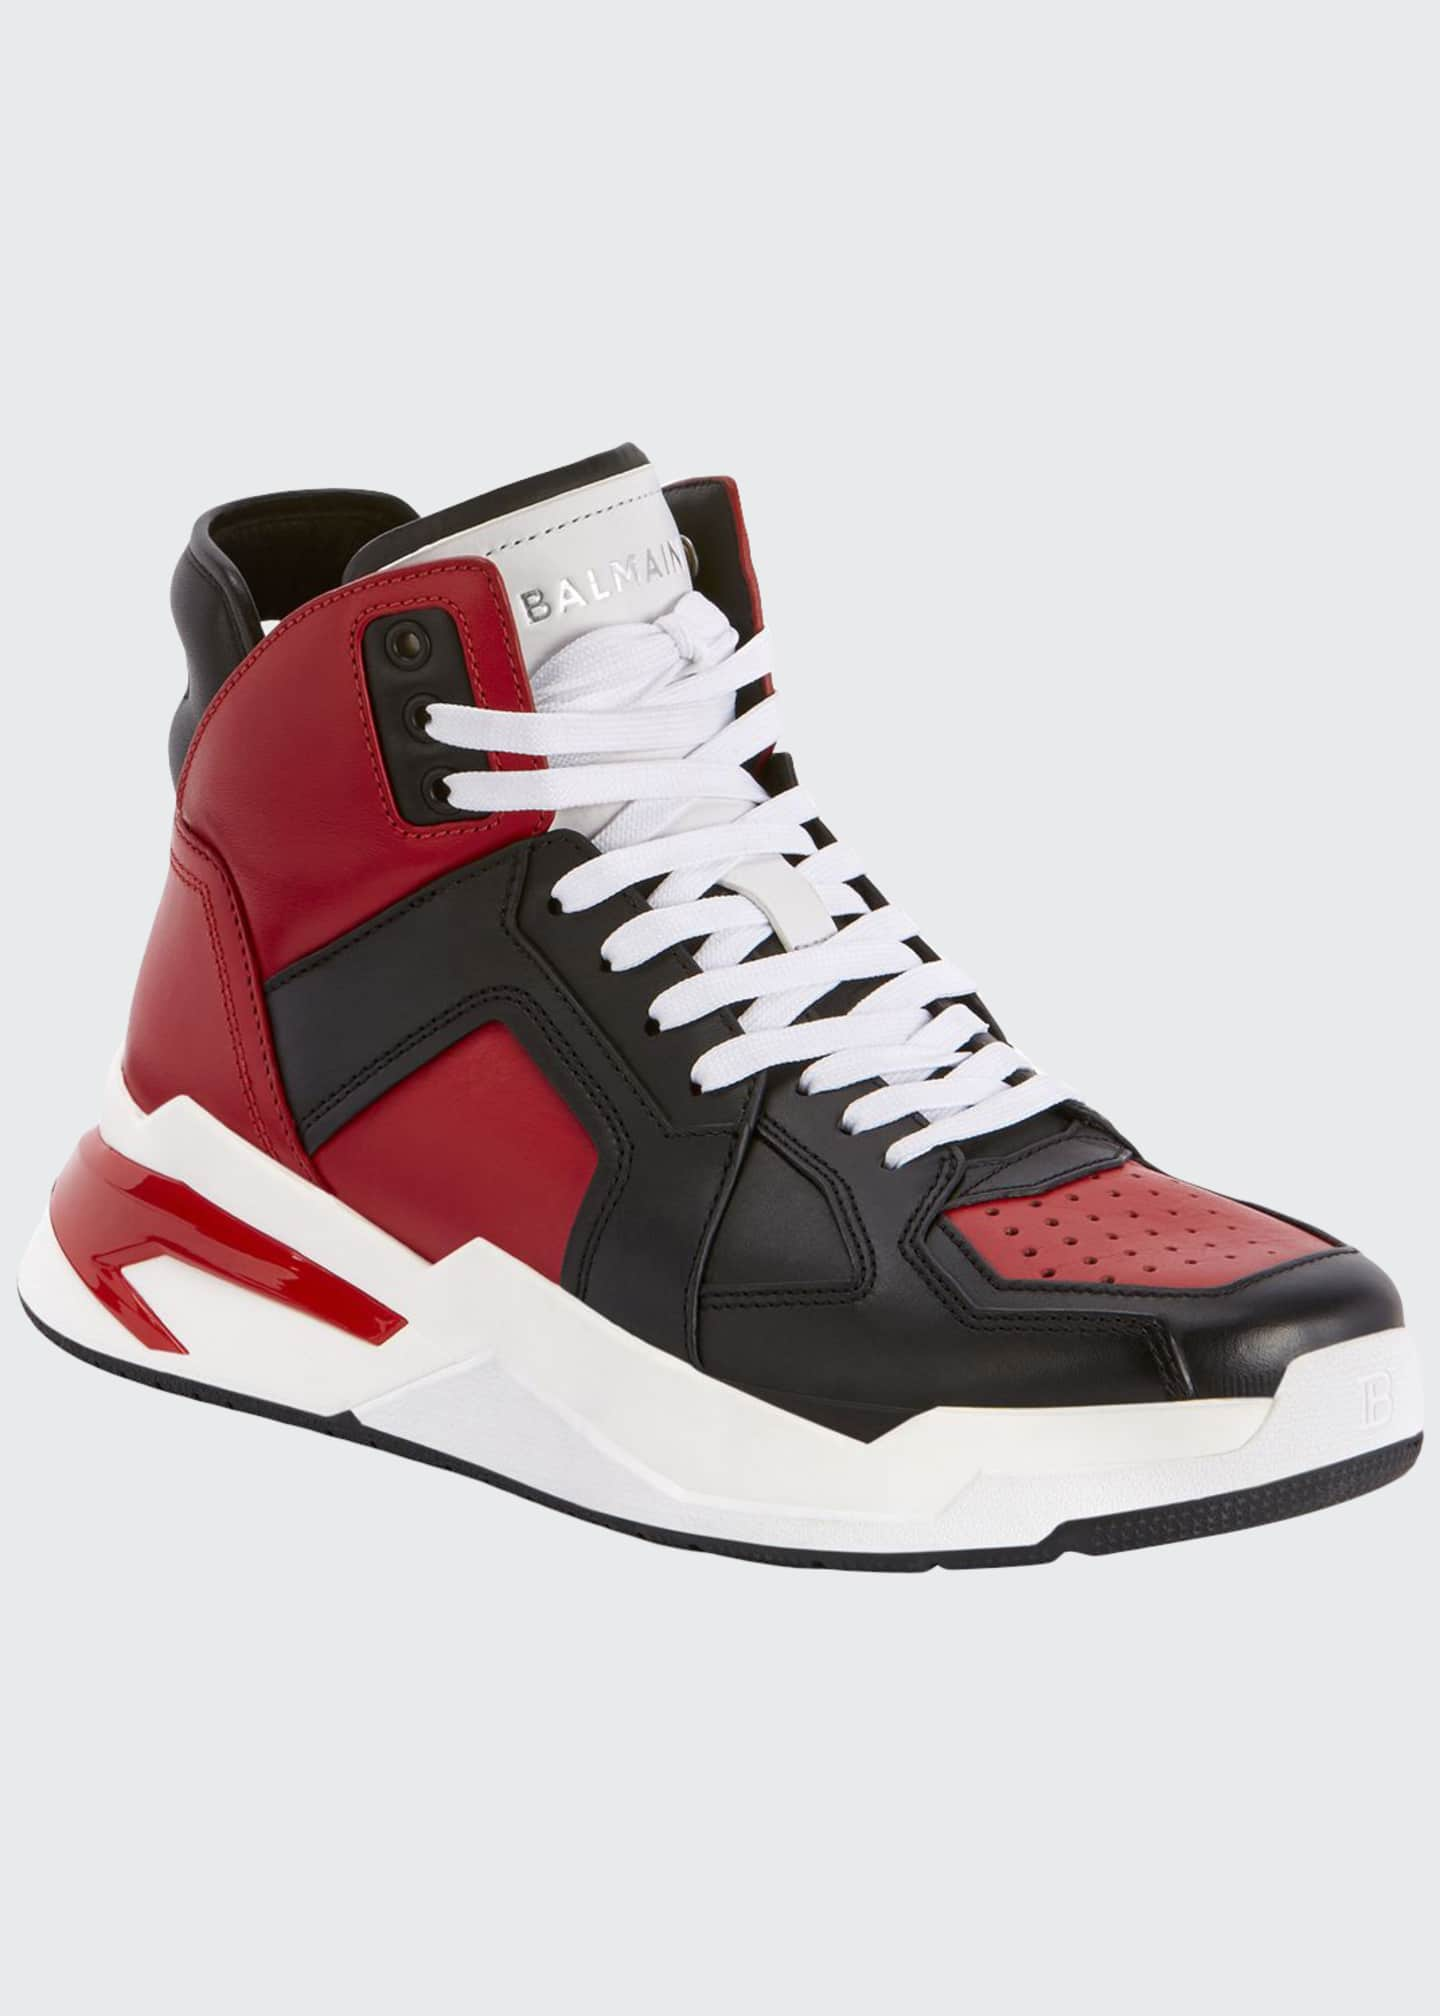 Balmain Men's B Ball Colorblock Leather High-Top Sneakers